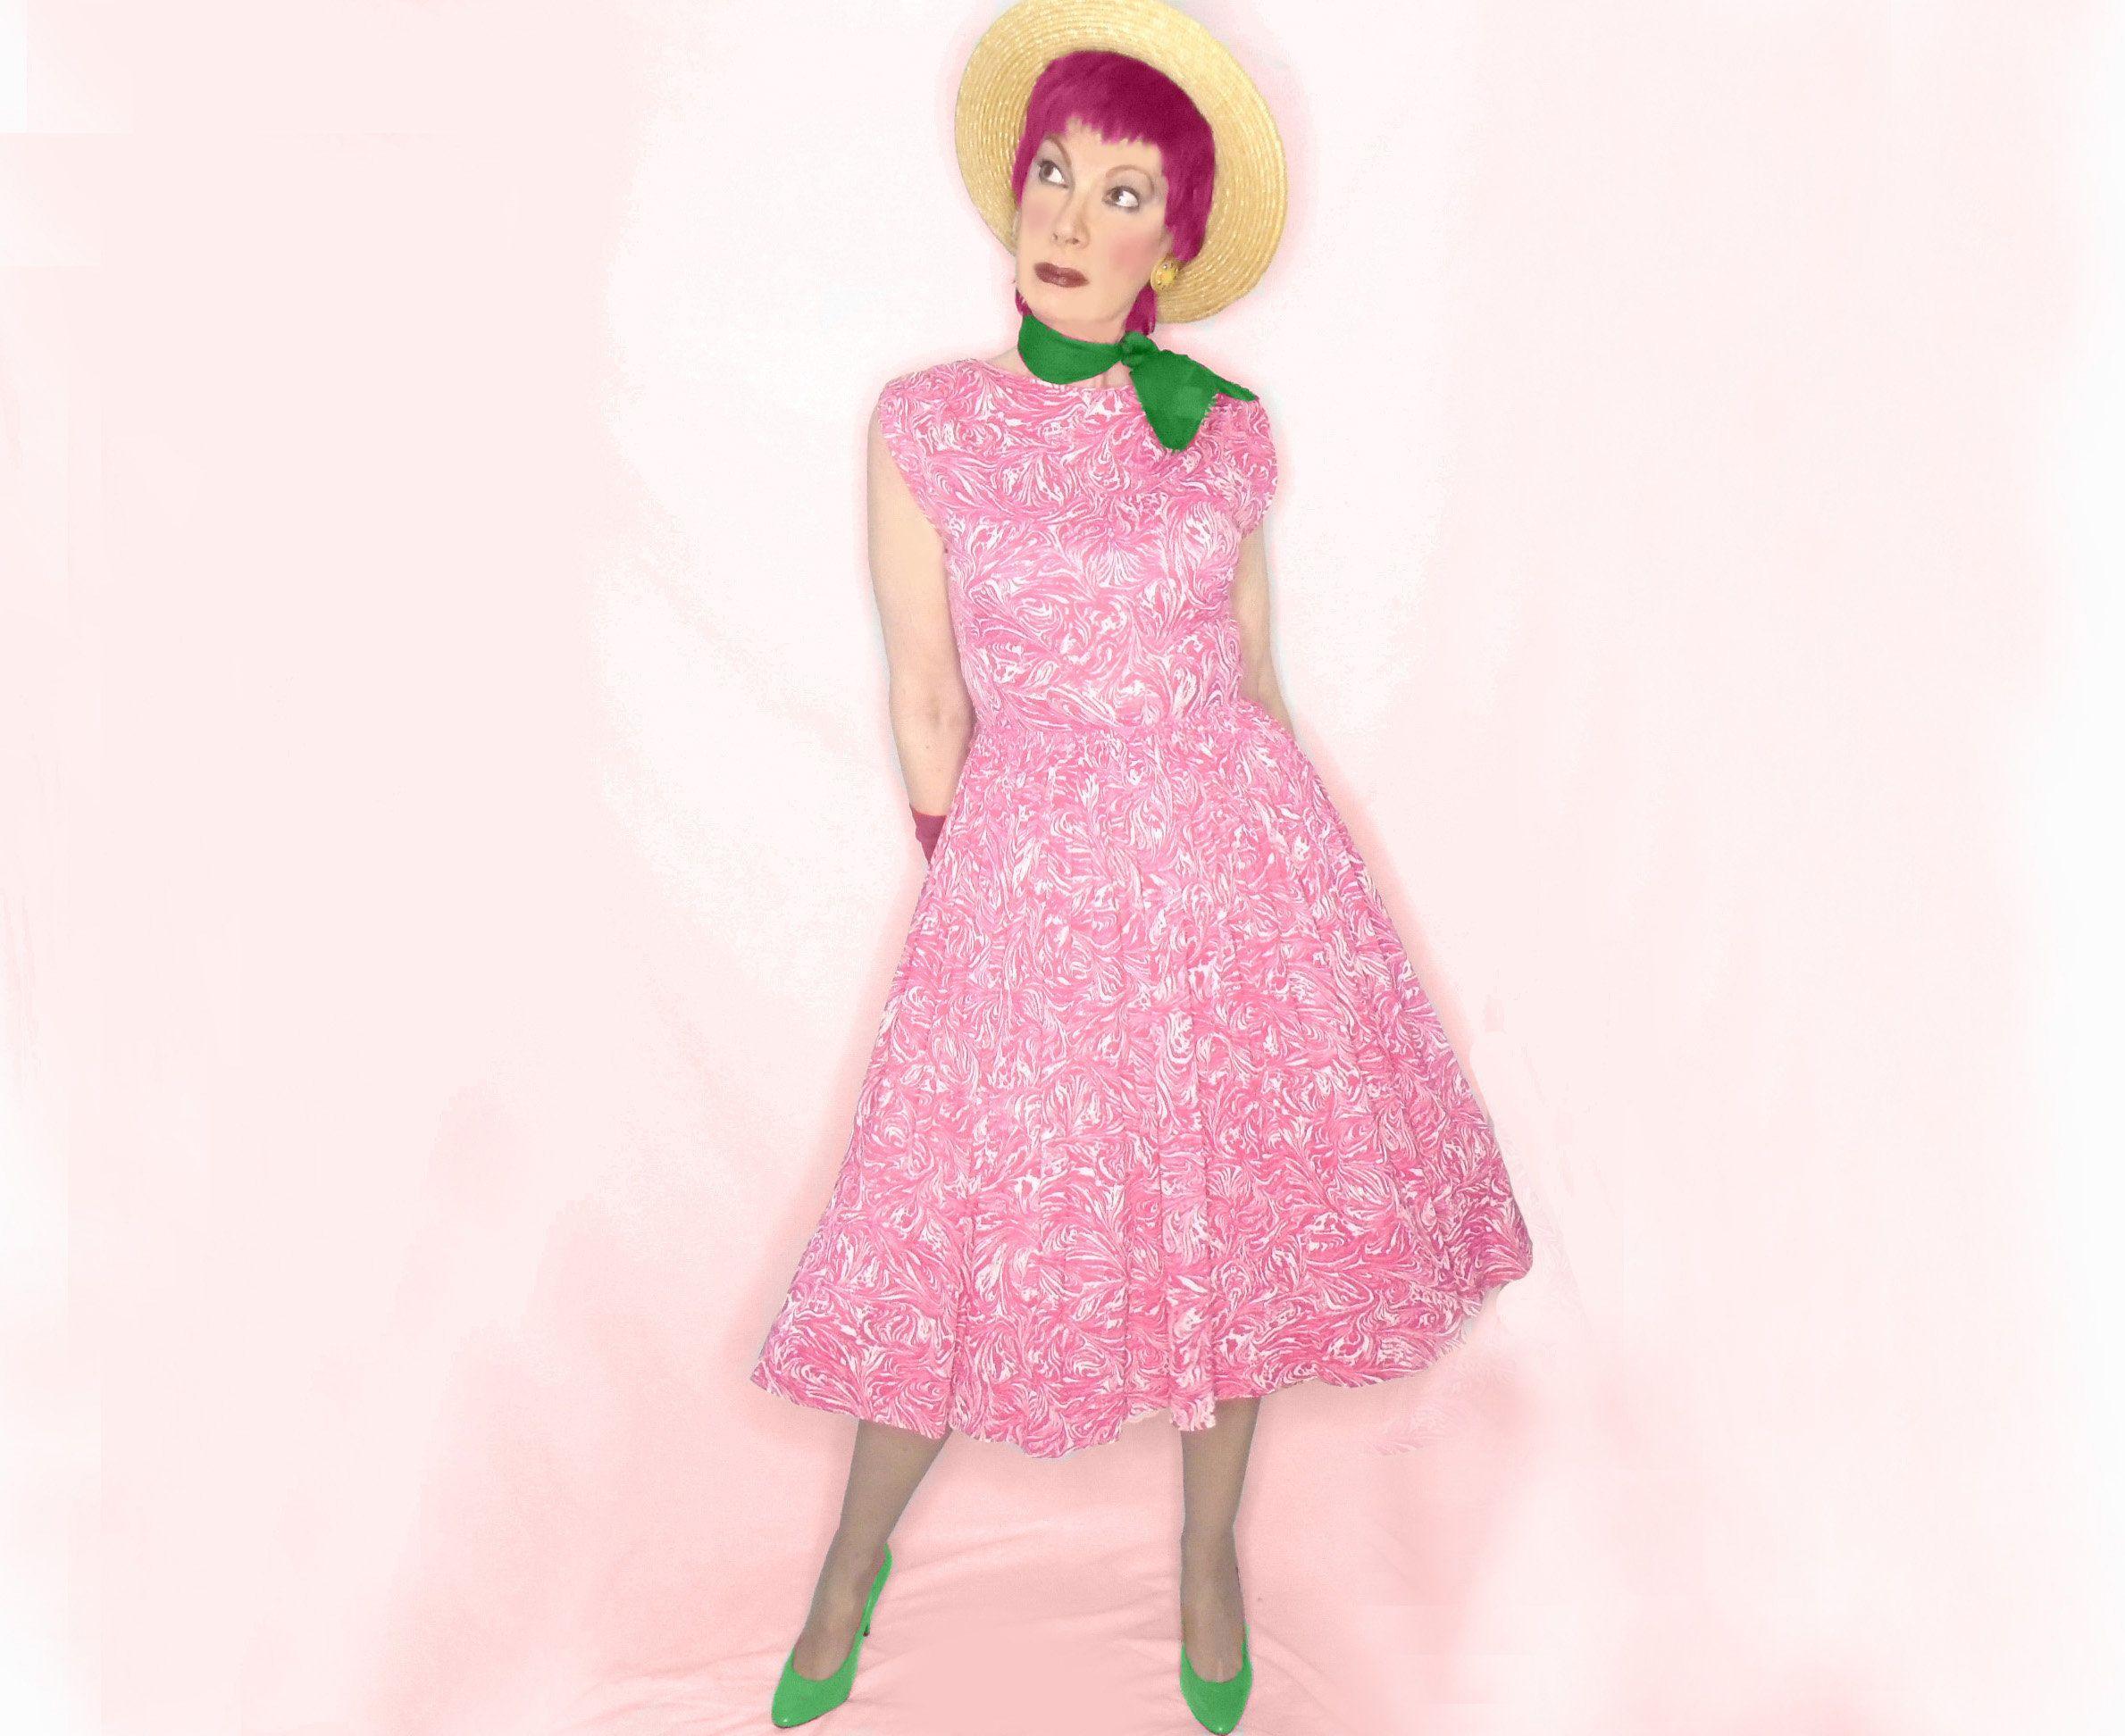 47+ Rockabilly wedding guest dresses ideas in 2021